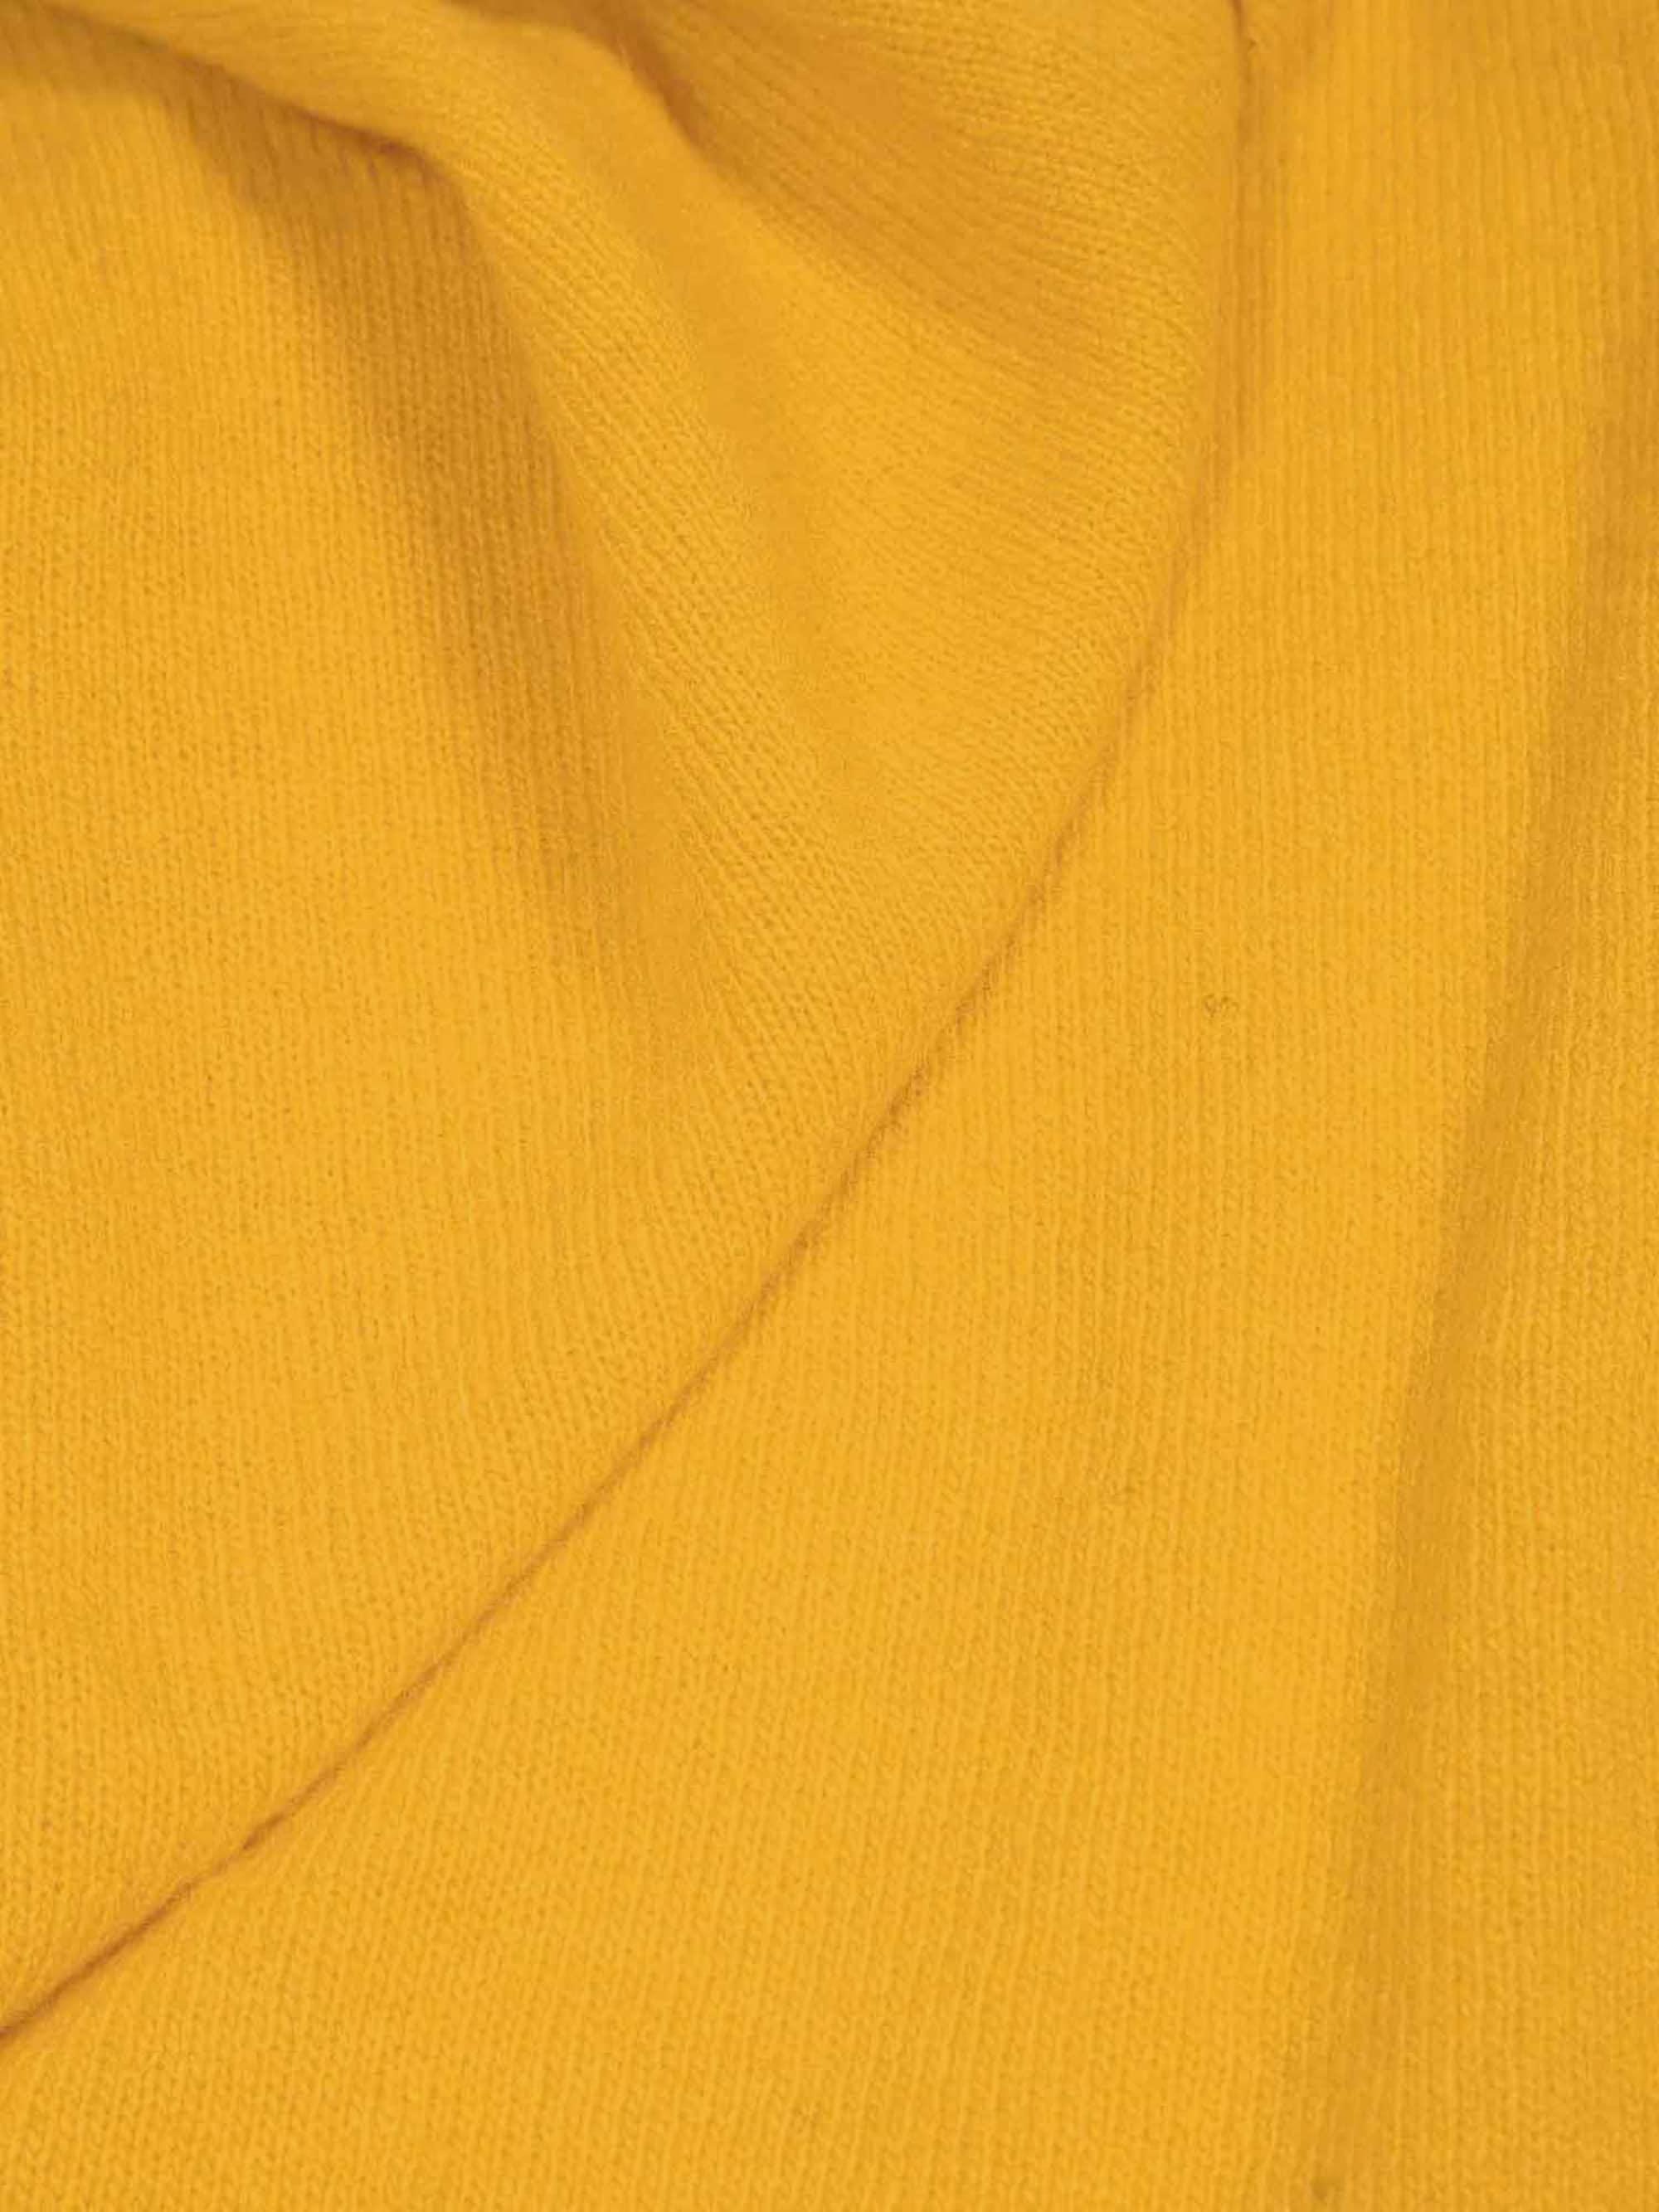 Dreieckstuch Cashmere Gelb